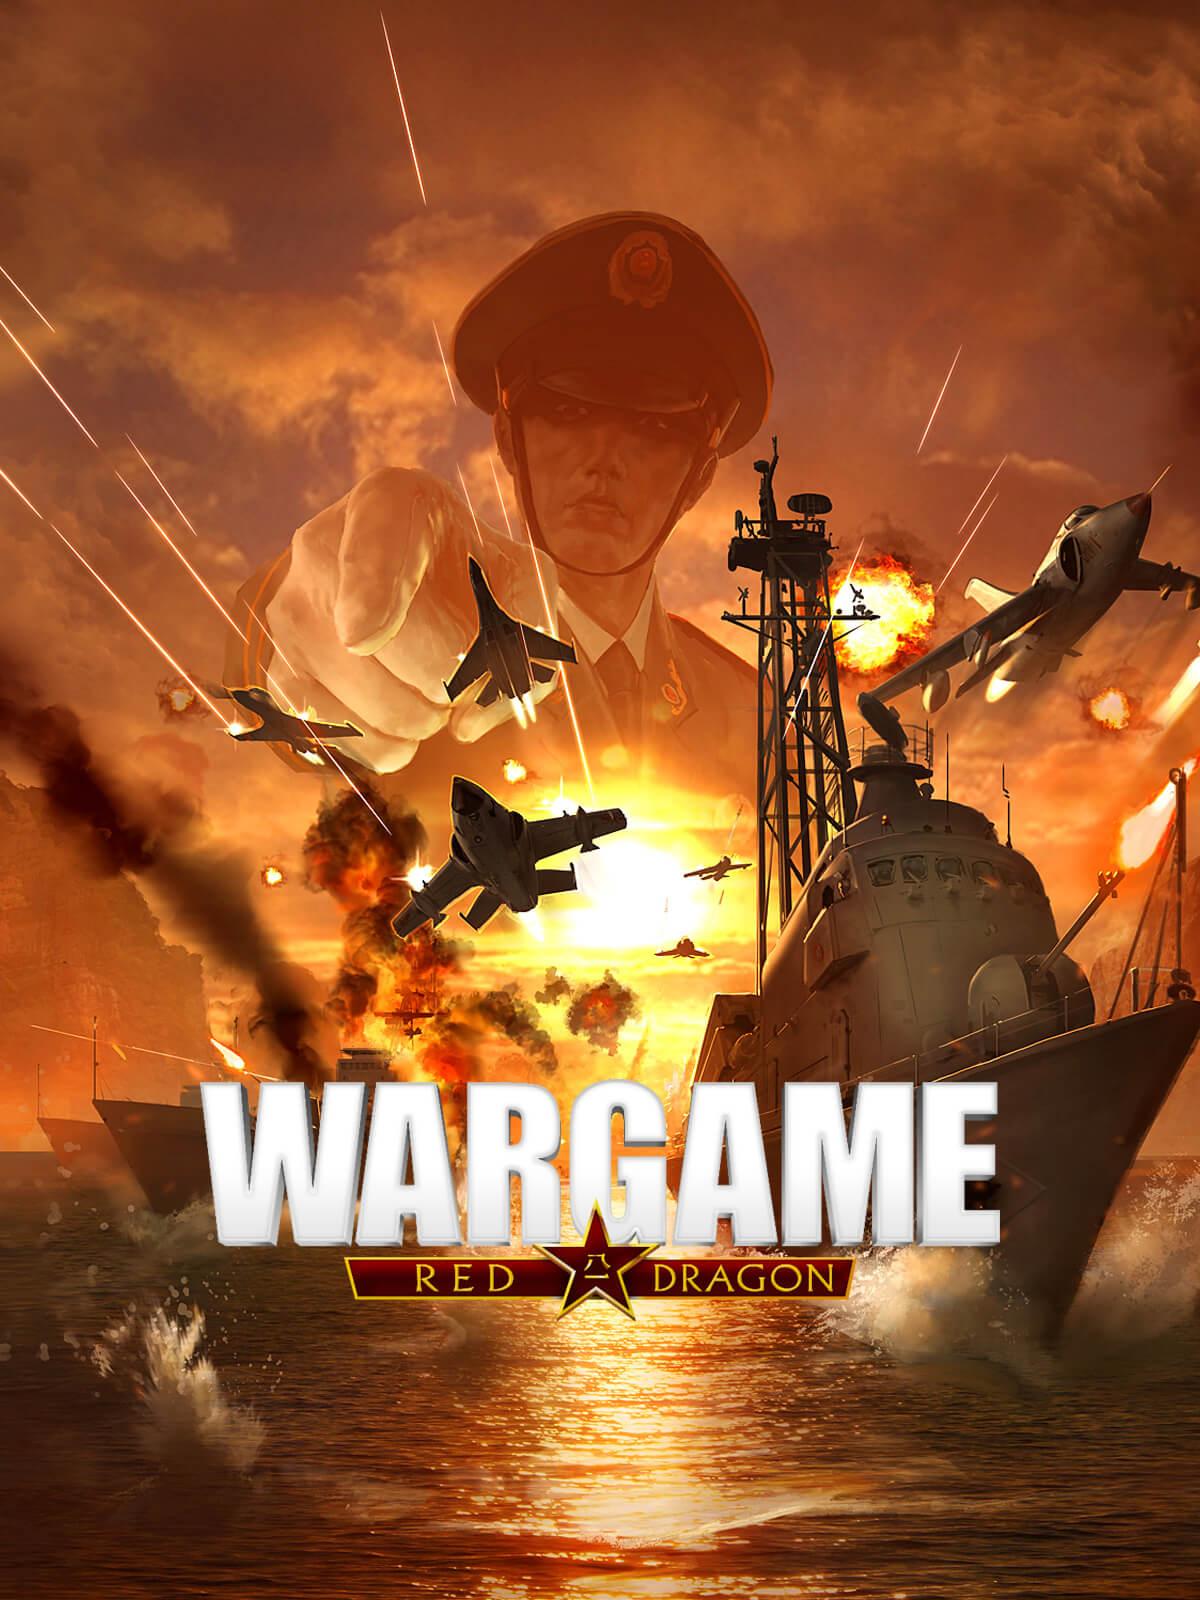 [gratis] Wargame: Red Dragon @Epic Games (vanaf 4 maart tot 11 maart)